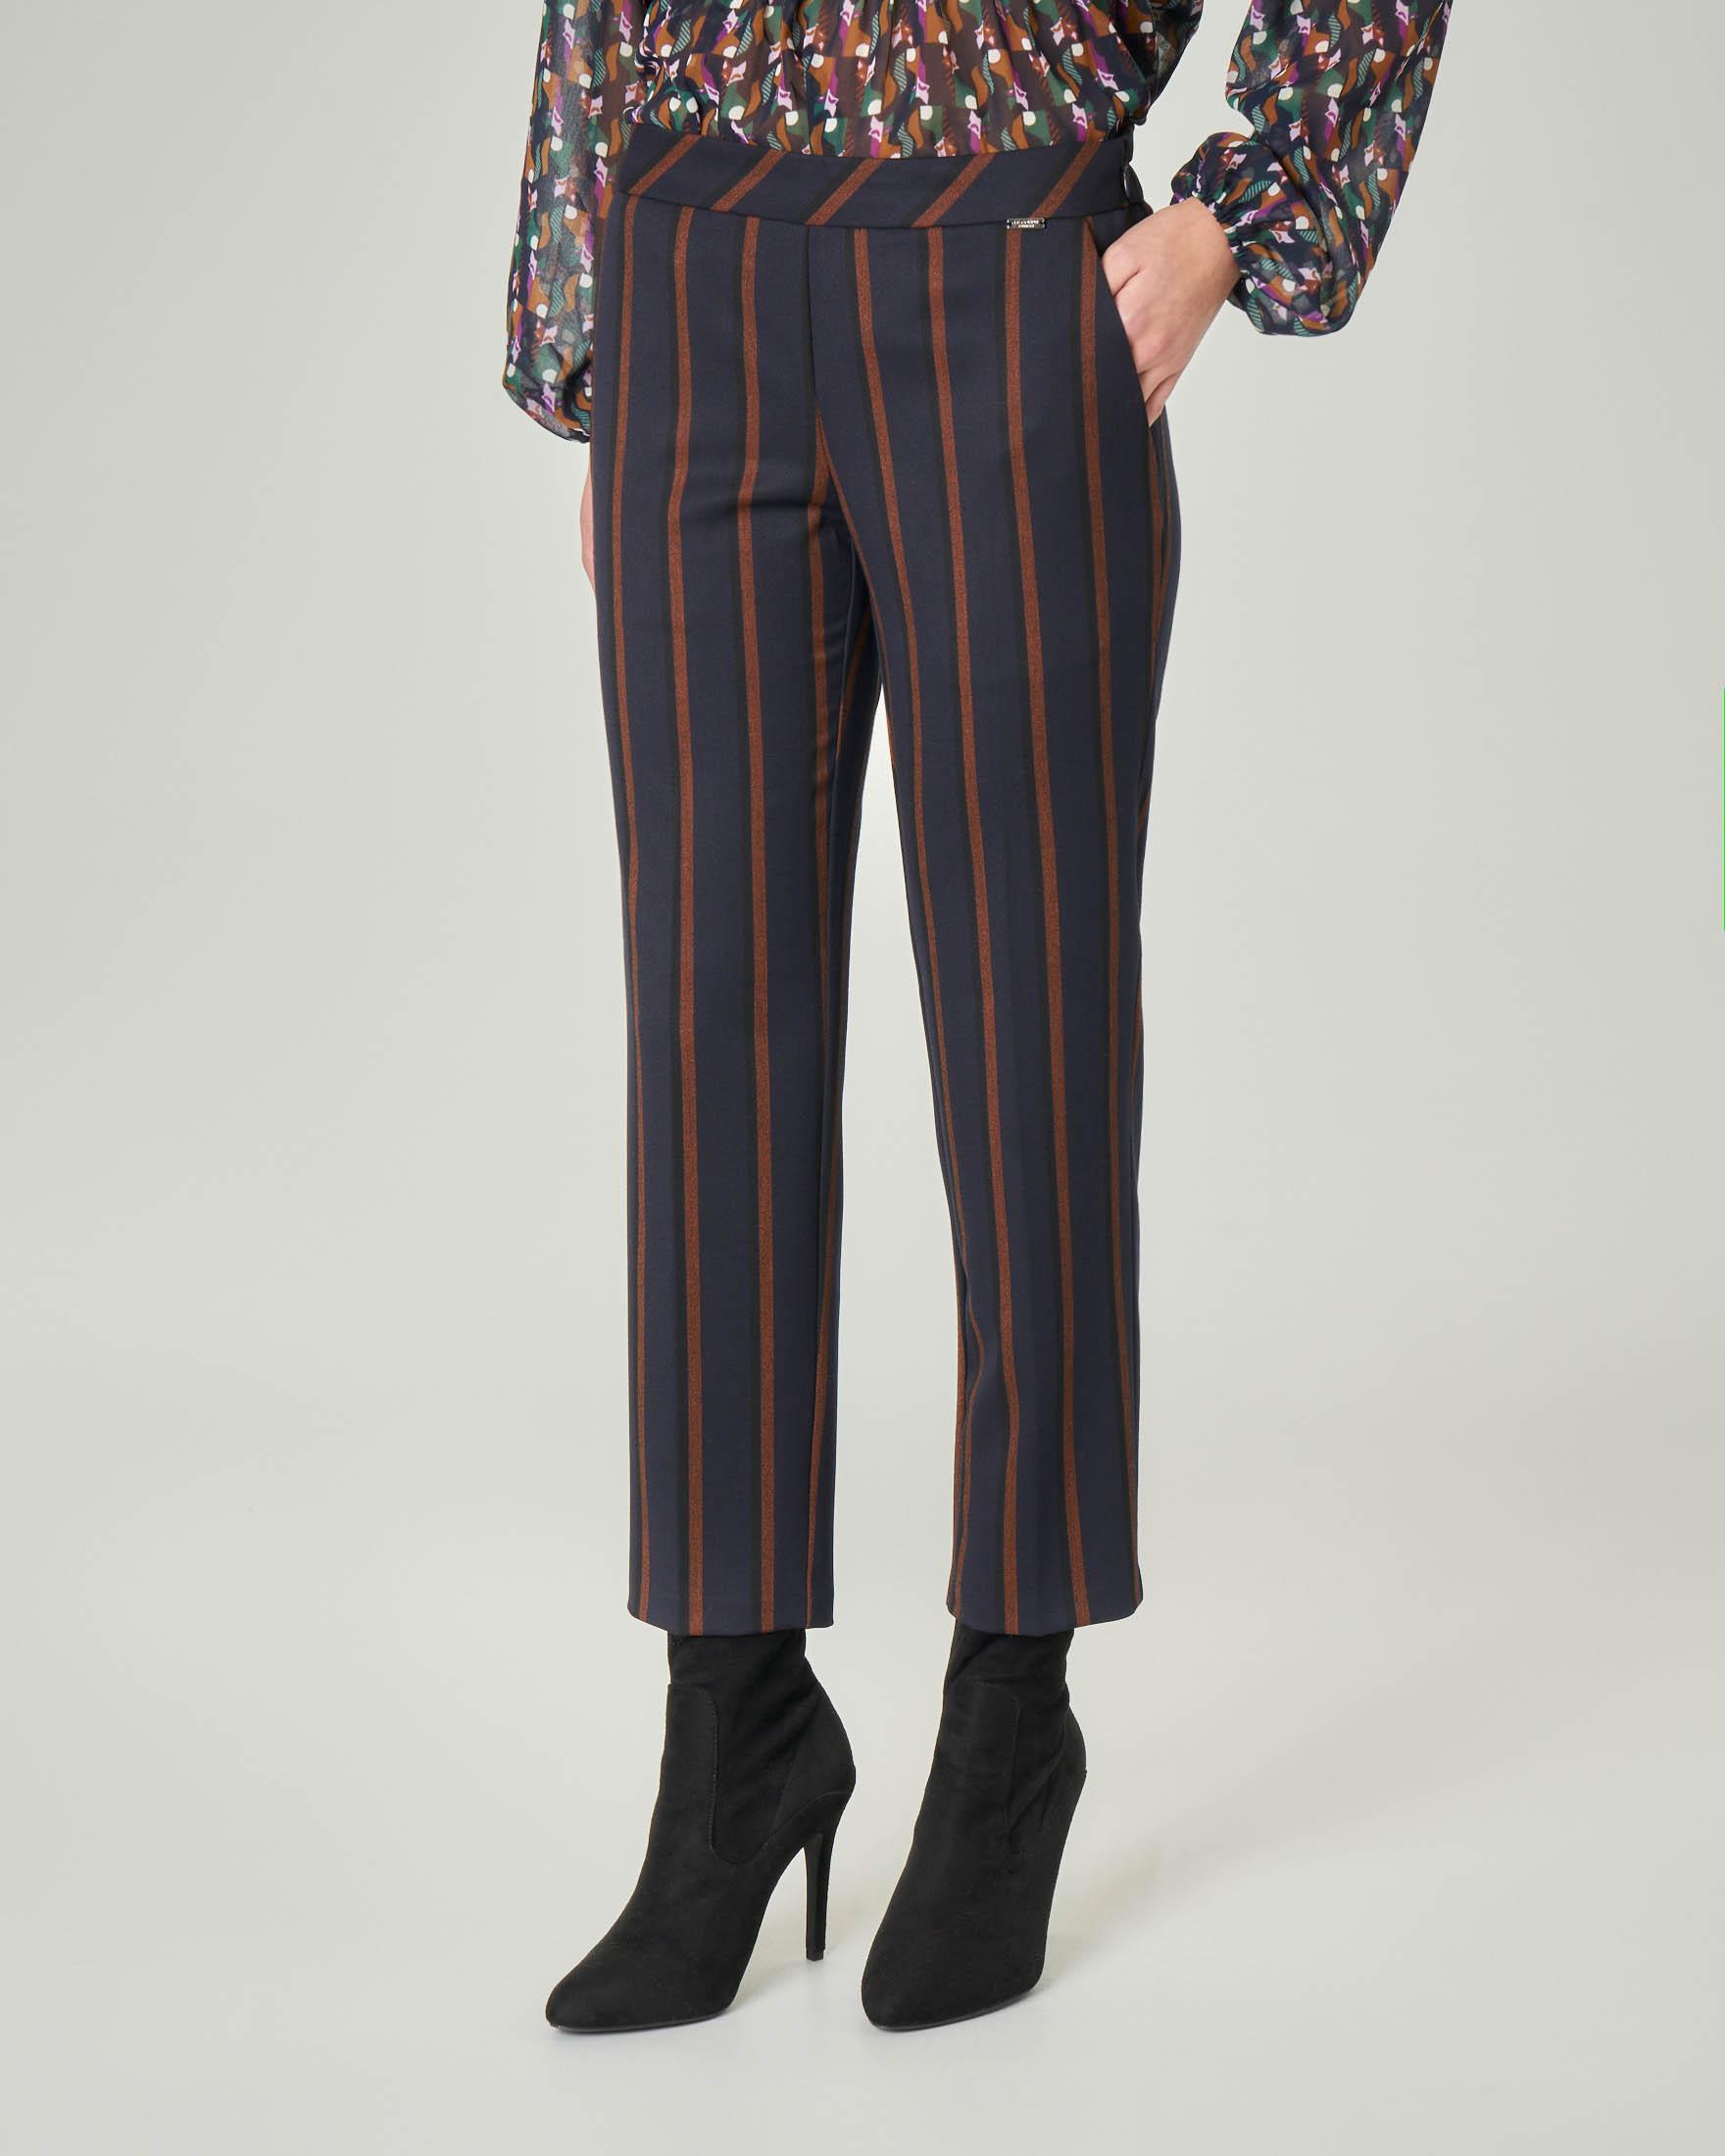 Pantalone a sigaretta blu gessato cammello